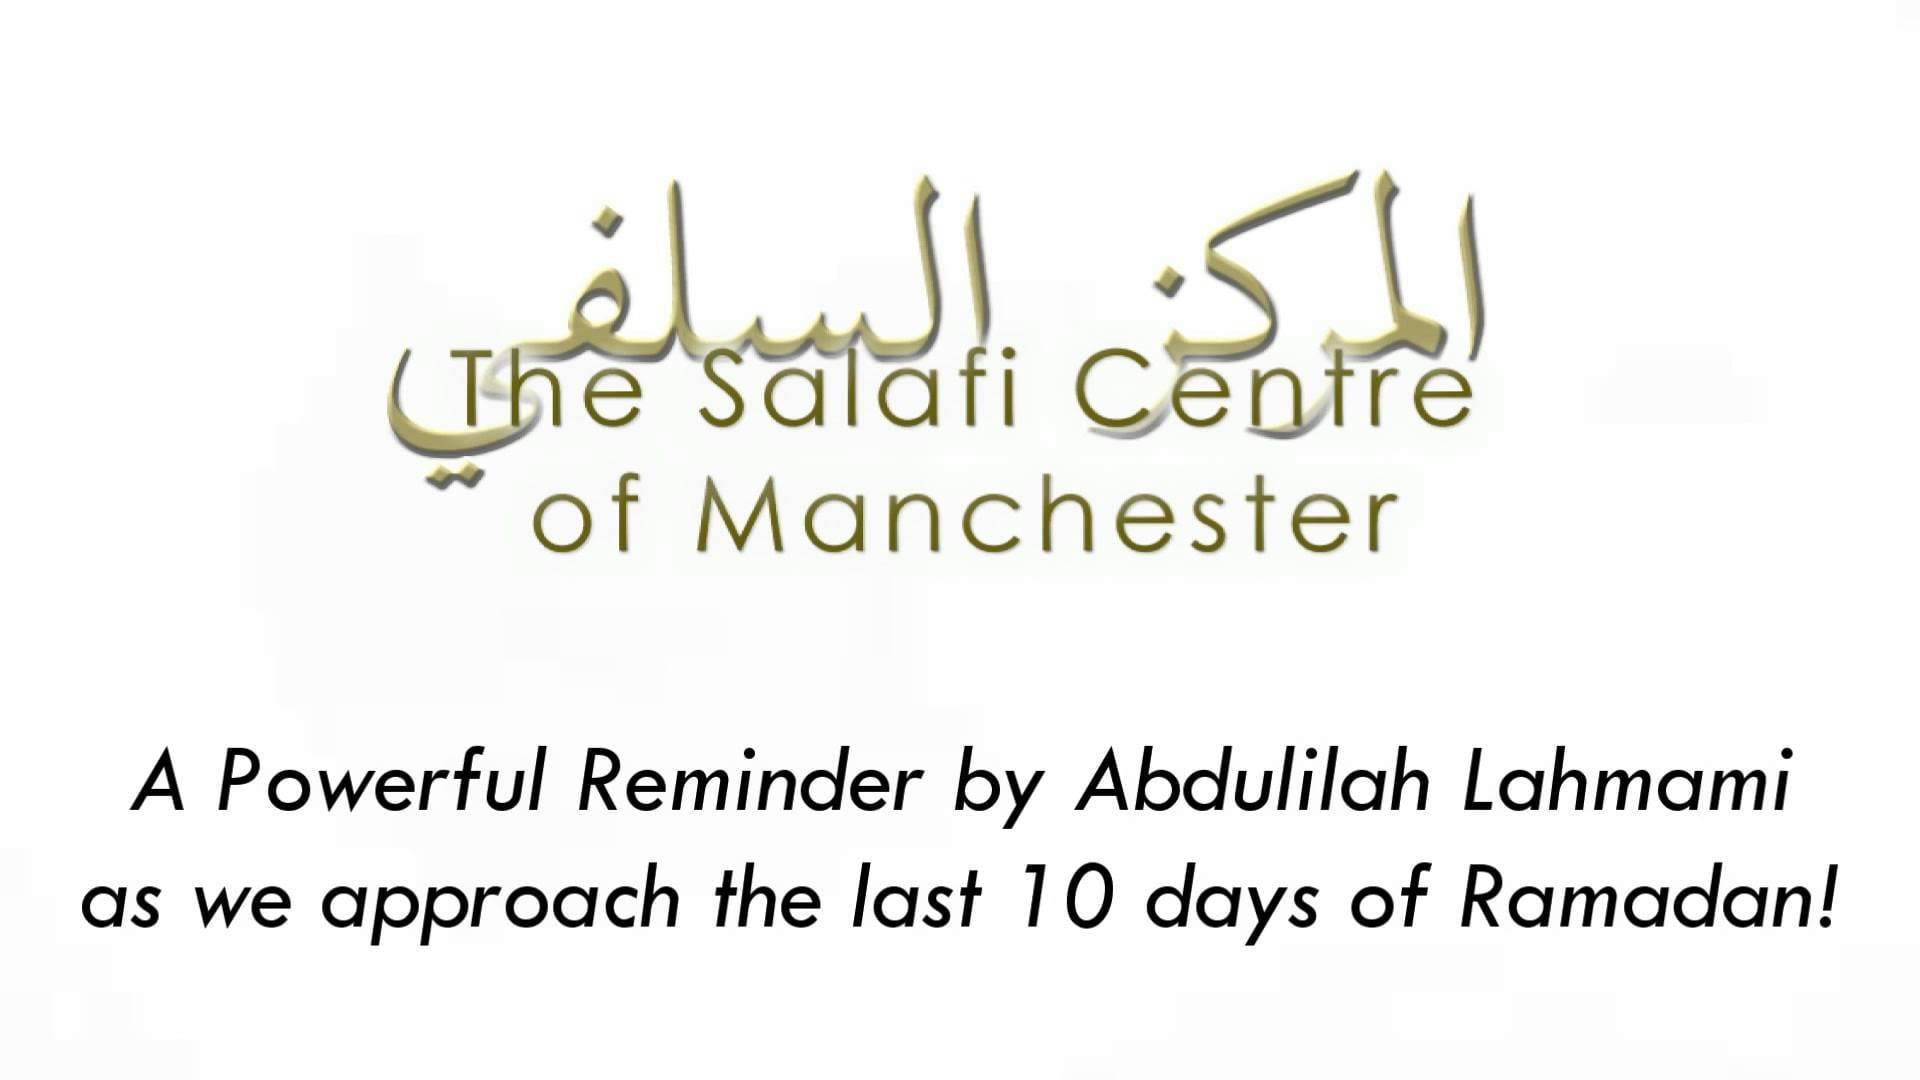 A Heartwarming Reminder by Abdulilah Lahmami